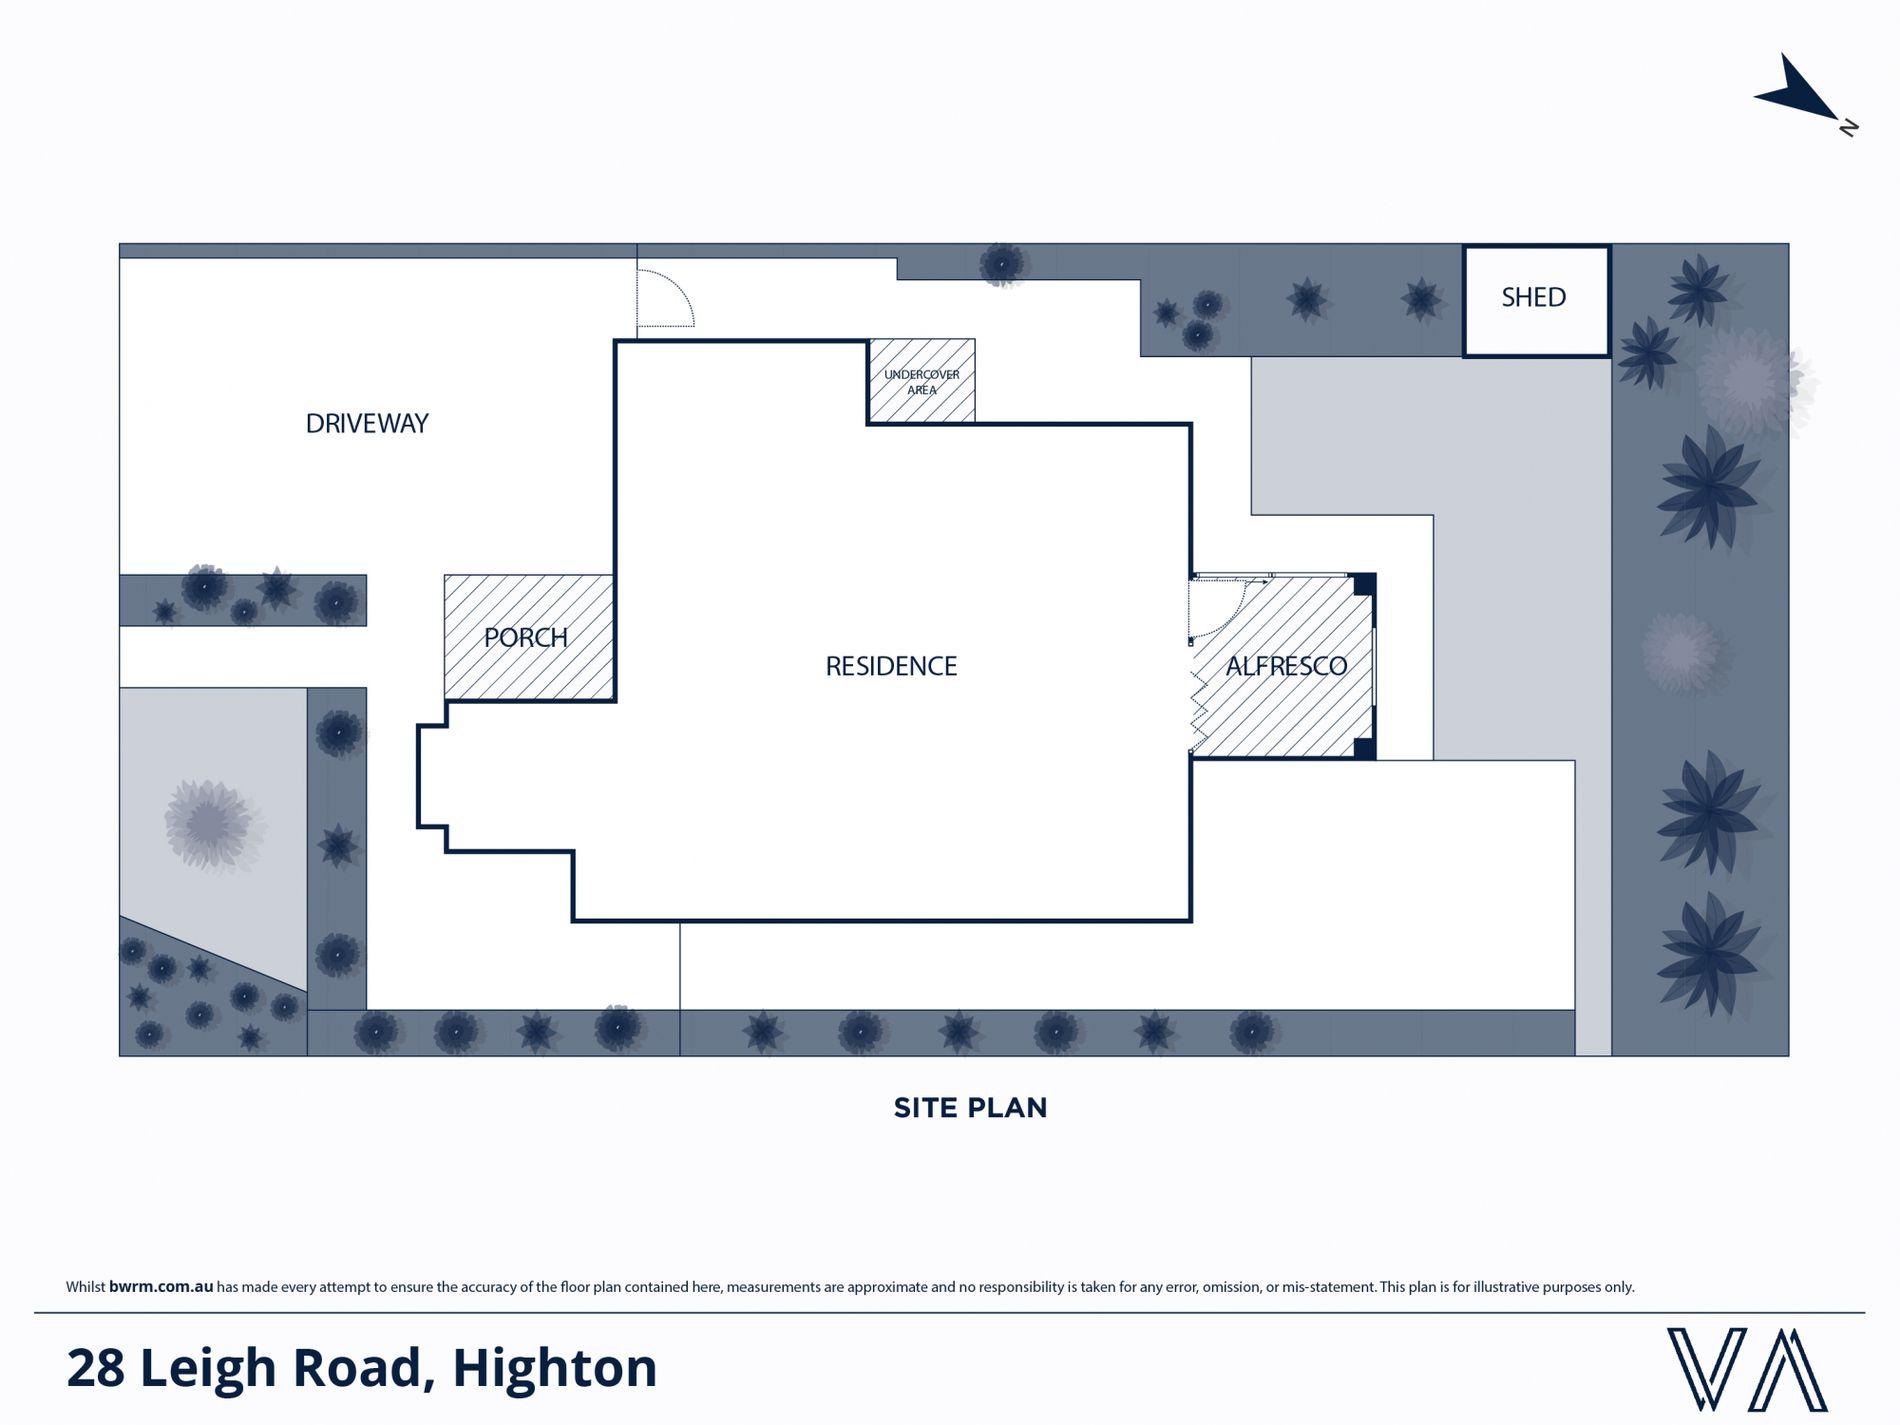 28 Leigh Road, Highton